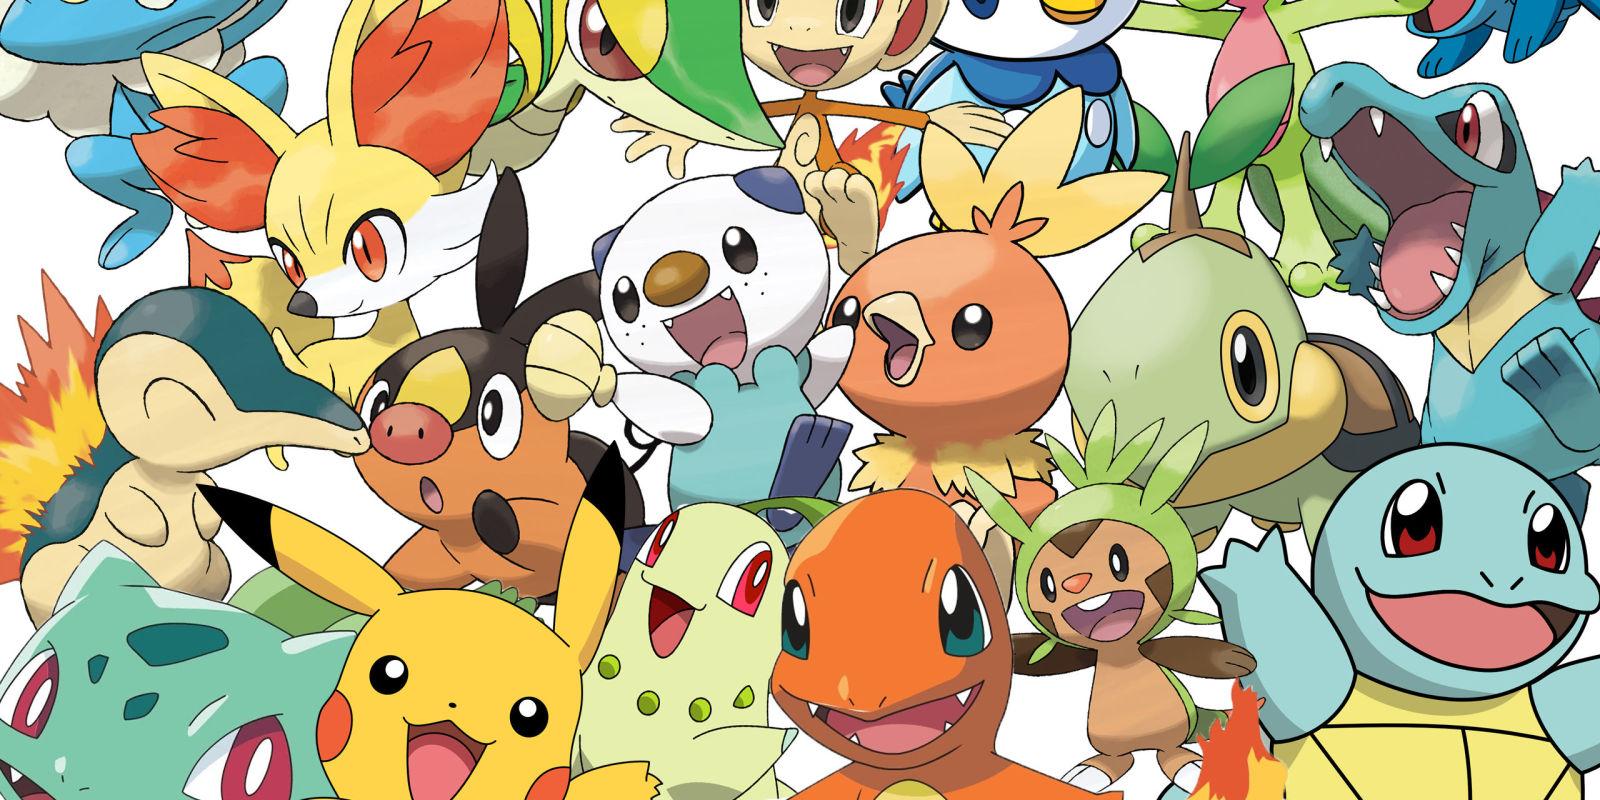 A GameStop description indicates there will be a Pokemon